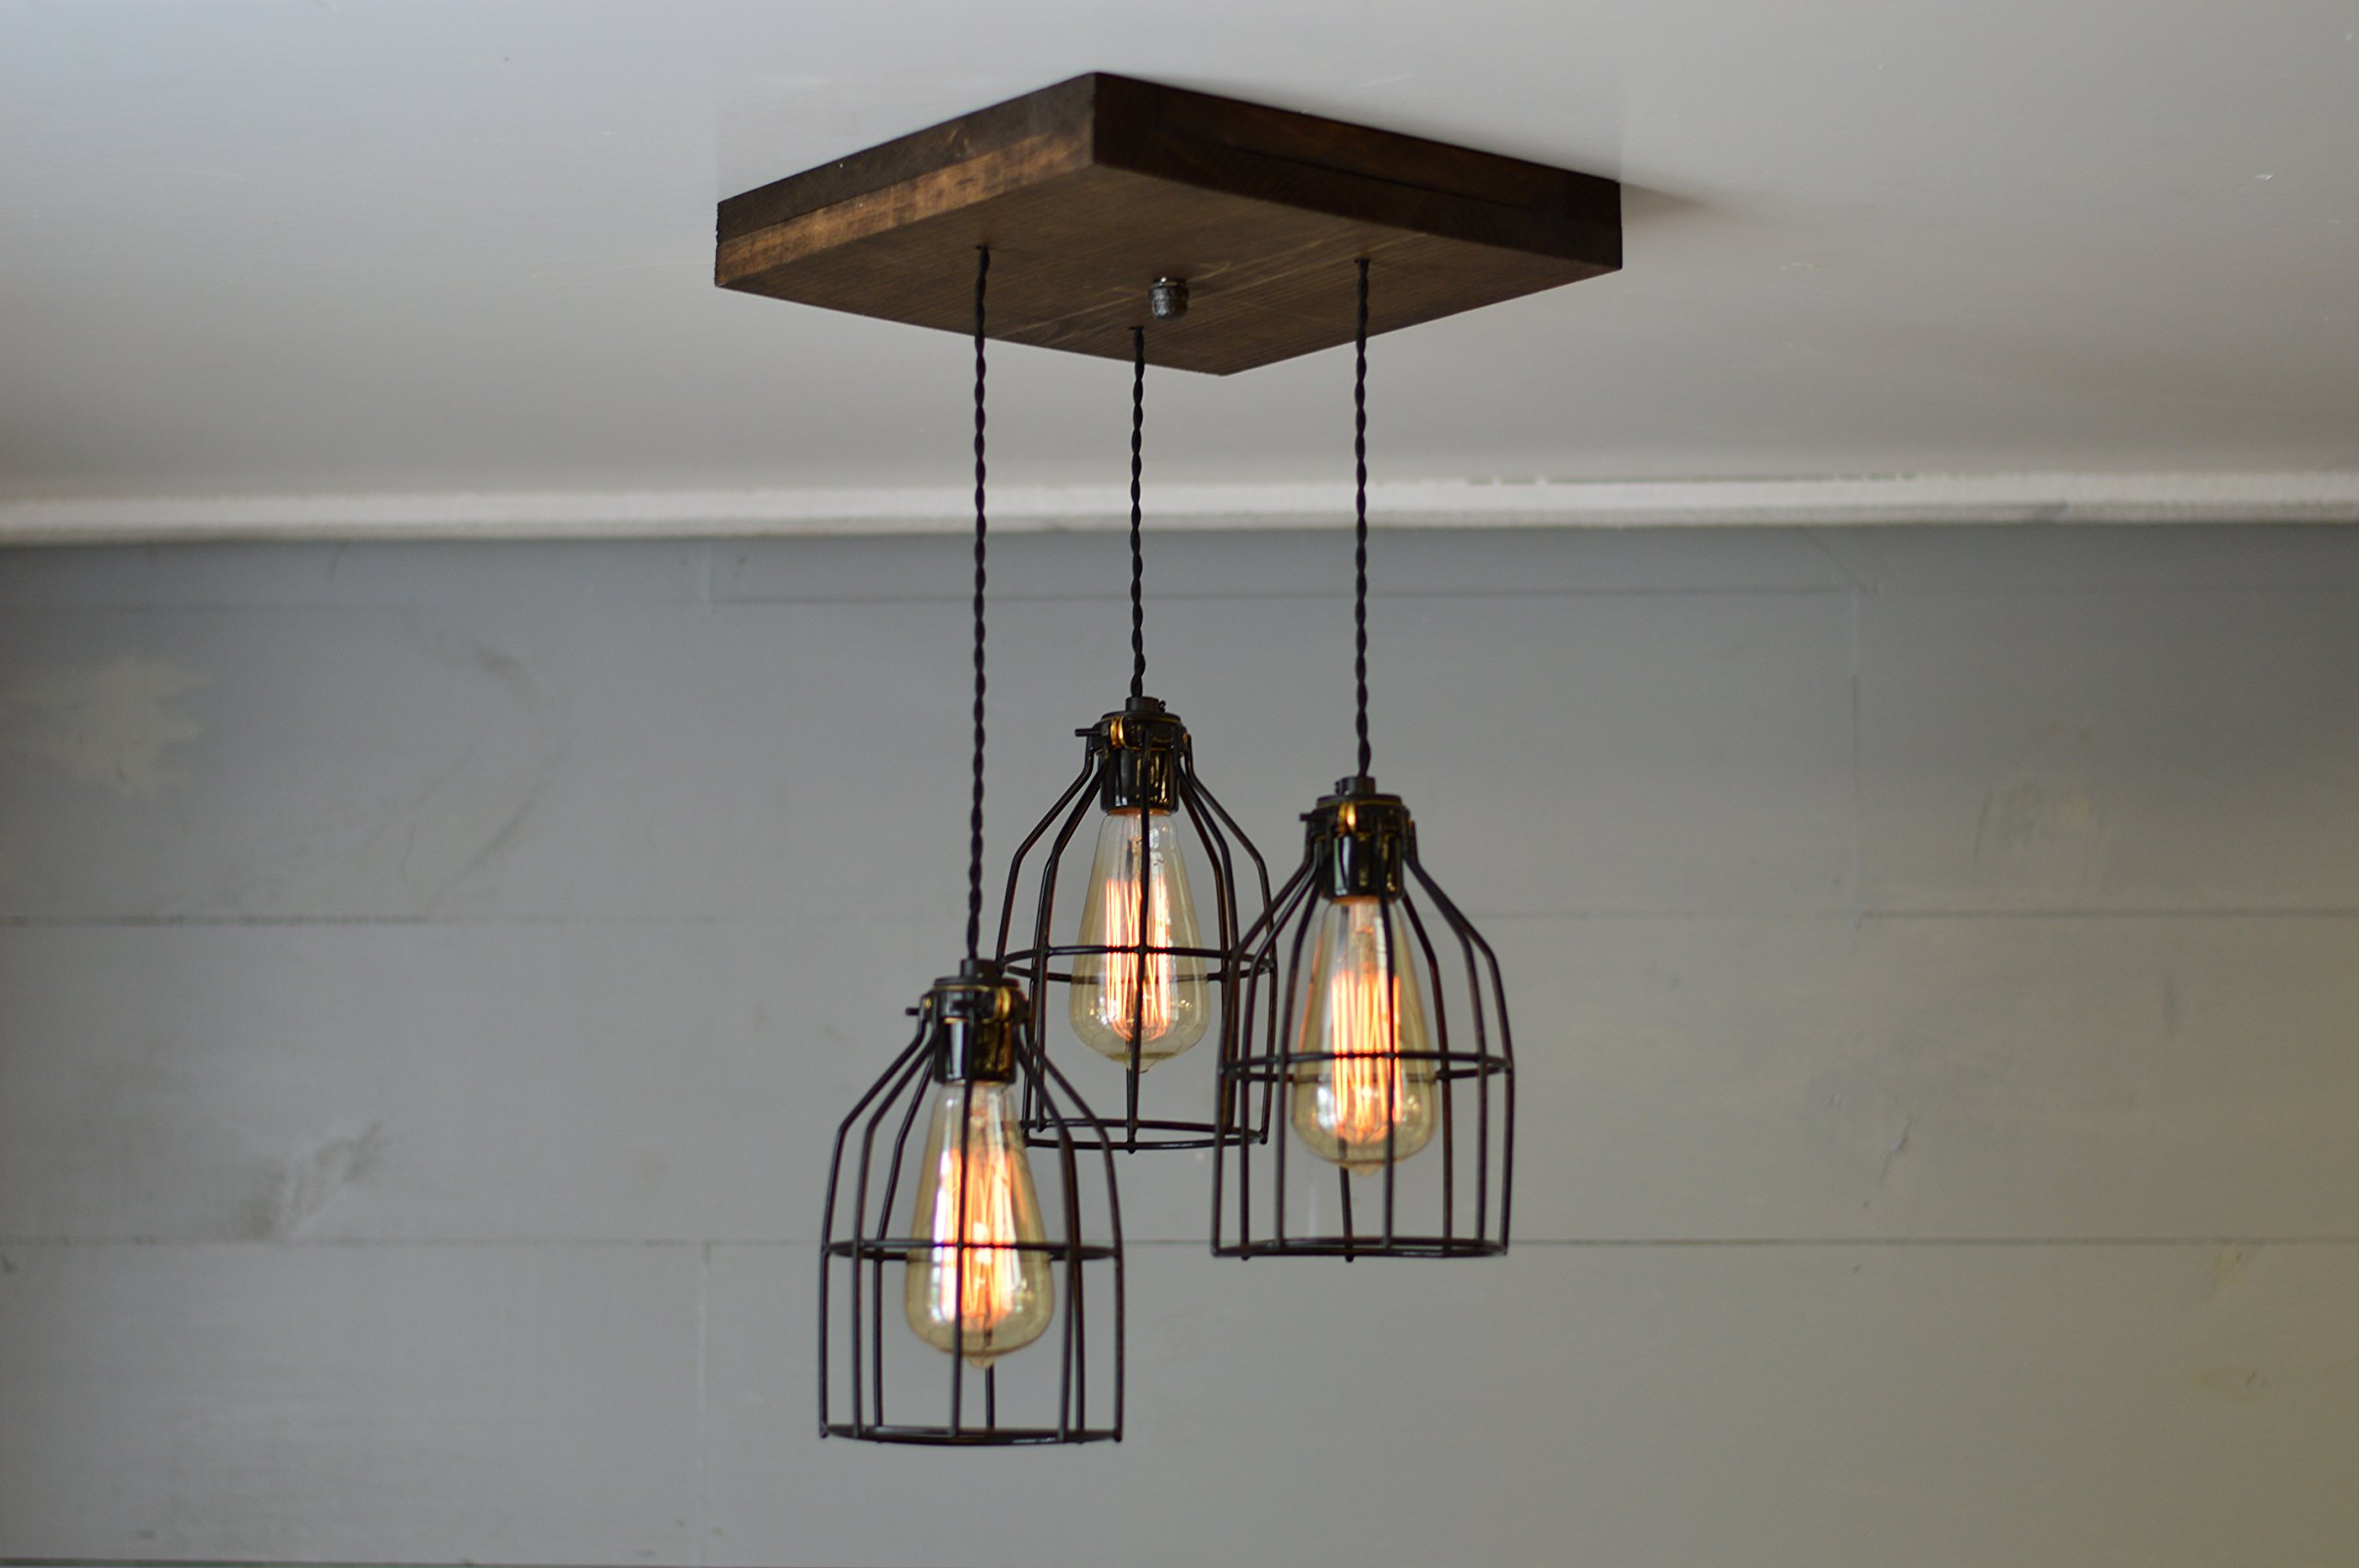 Old Elm Wood Multi Pendant Light (W/Black Cages) by West Ninth Vintage